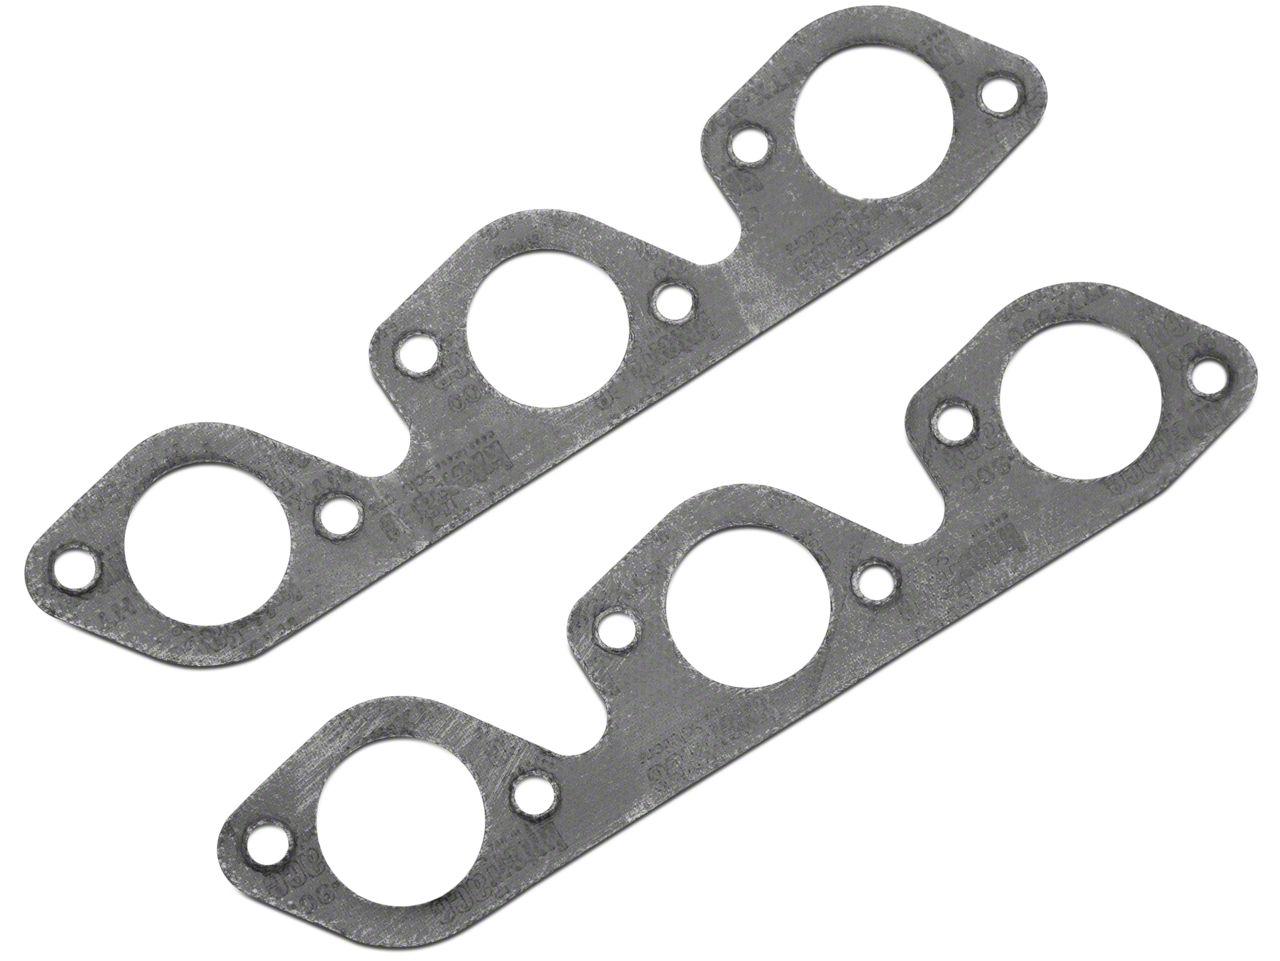 BBK Premium Header Gaskets (94-04 V6)